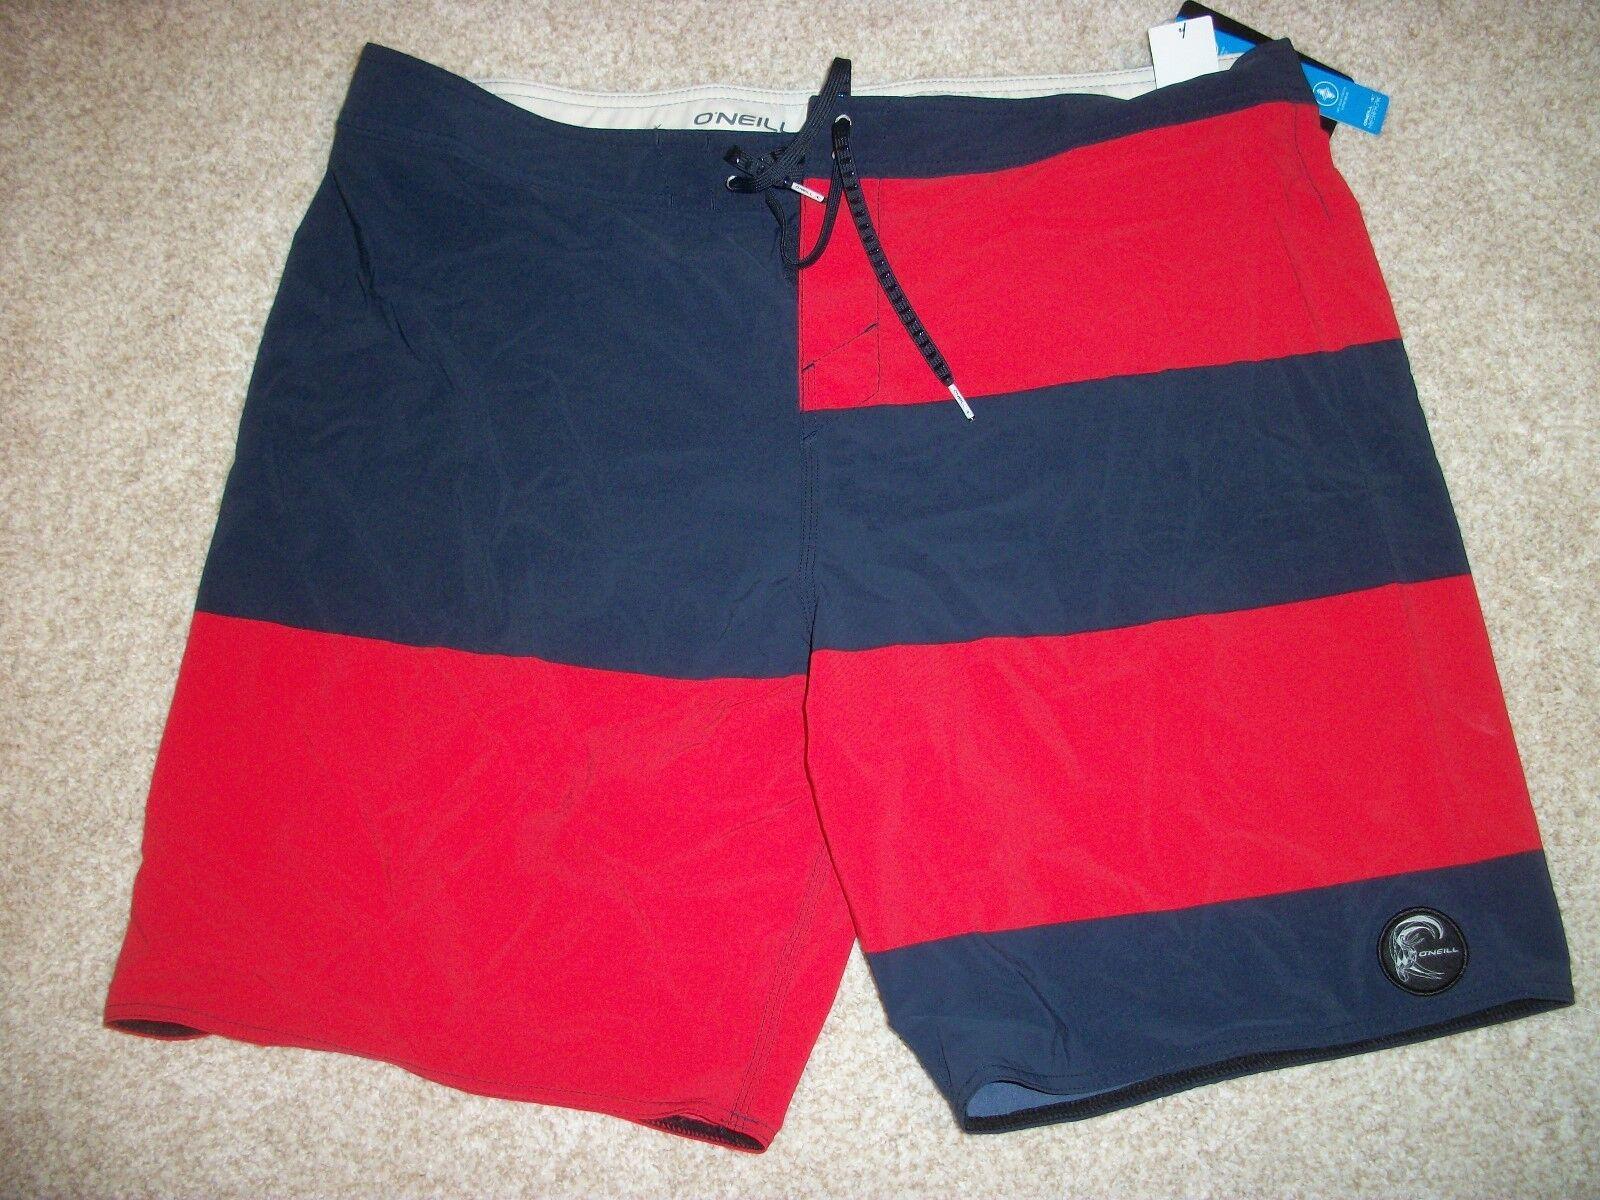 O'NEILL New NWT Mens 40 BOARD SWIM SHORTS Boardshorts bluee Red Hyperfreak